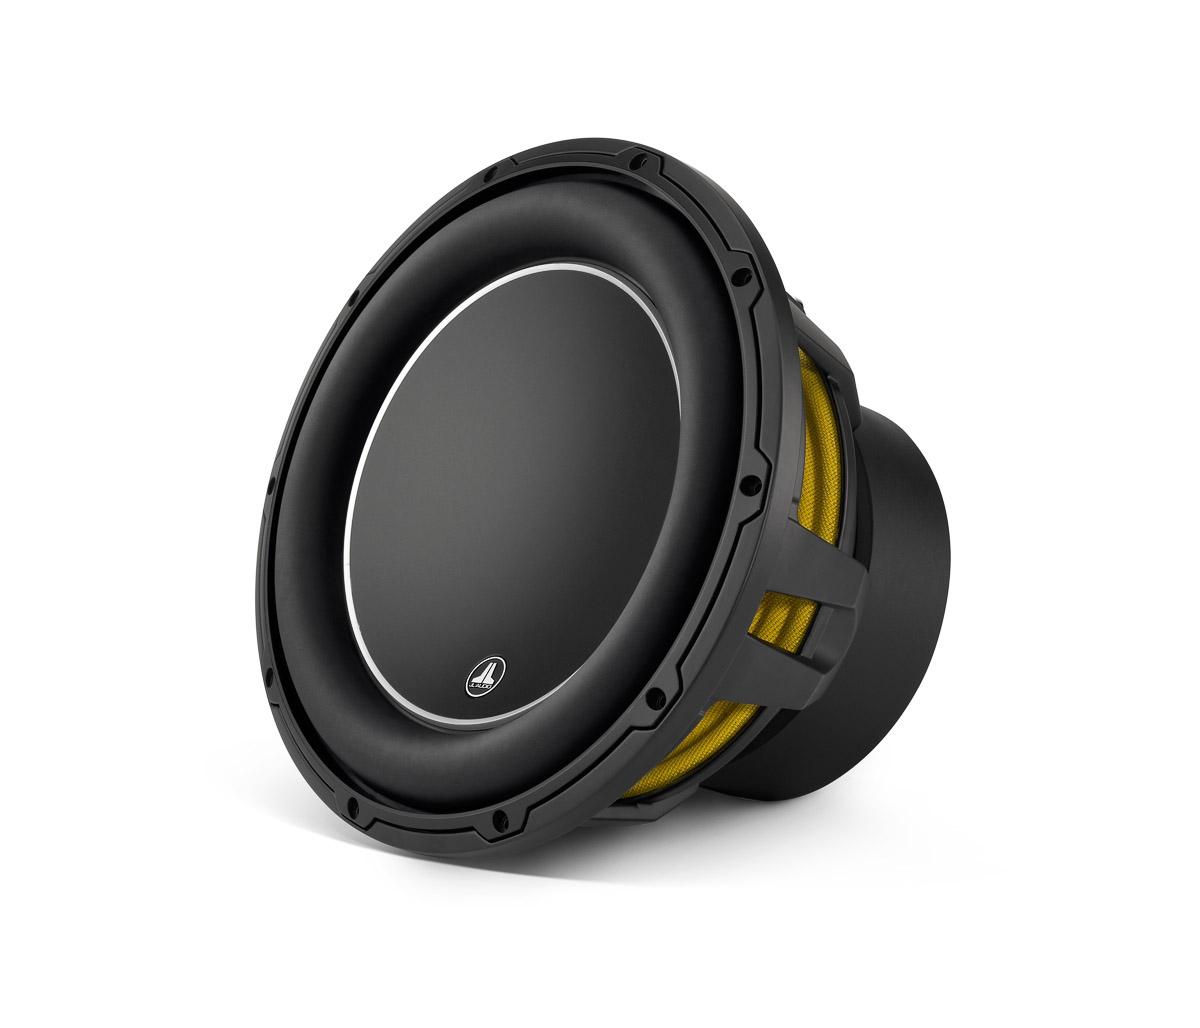 12W6v3-D4 - Car Audio - Subwoofer Drivers - W6v3 - JL Audio on